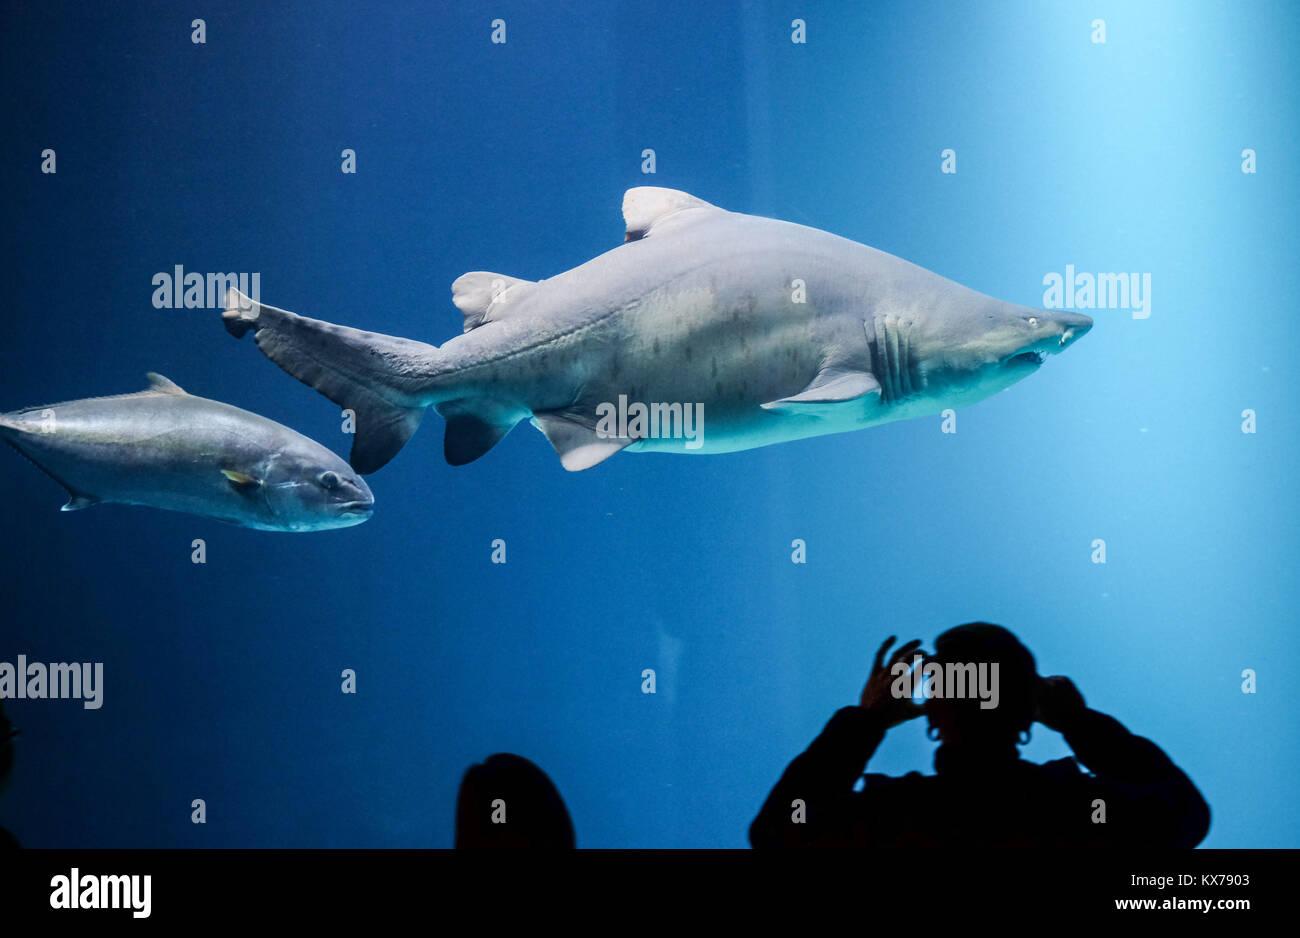 A Sand Tiger Shark Swims In The Aquarium Offener Atlantik Lit